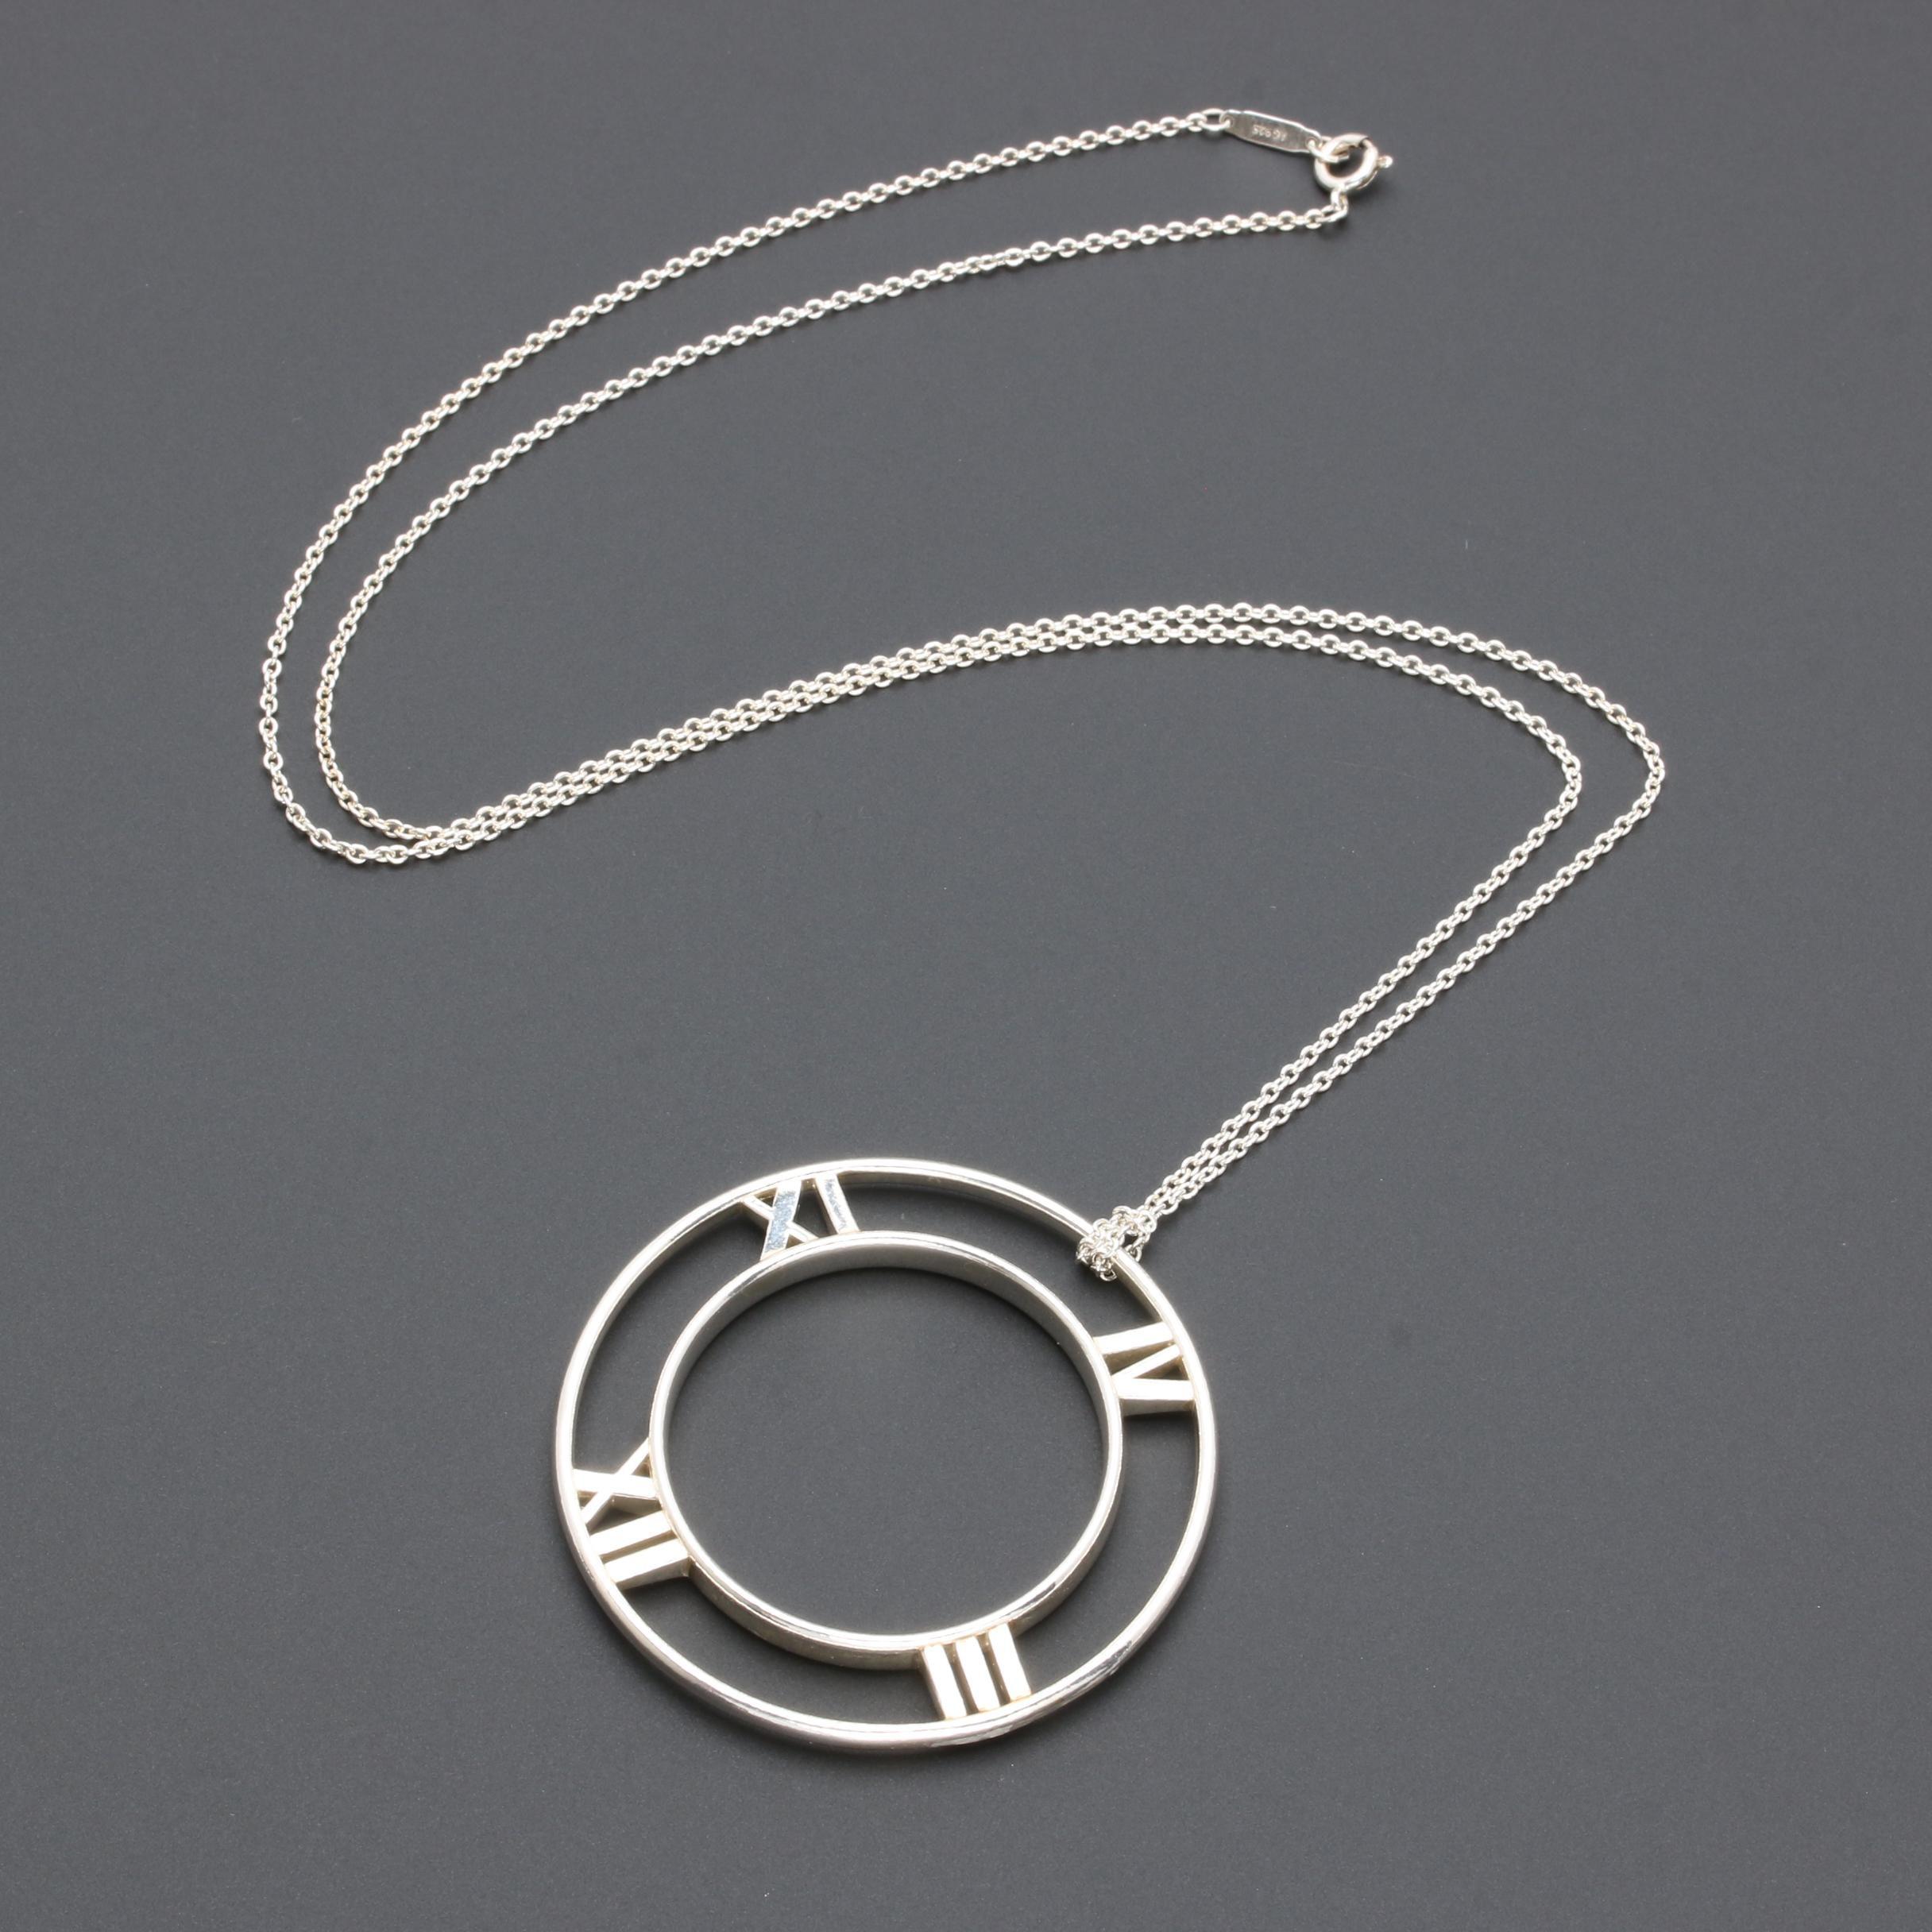 "Tiffany & Co. ""Atlas"" Collection Pendant Necklace"